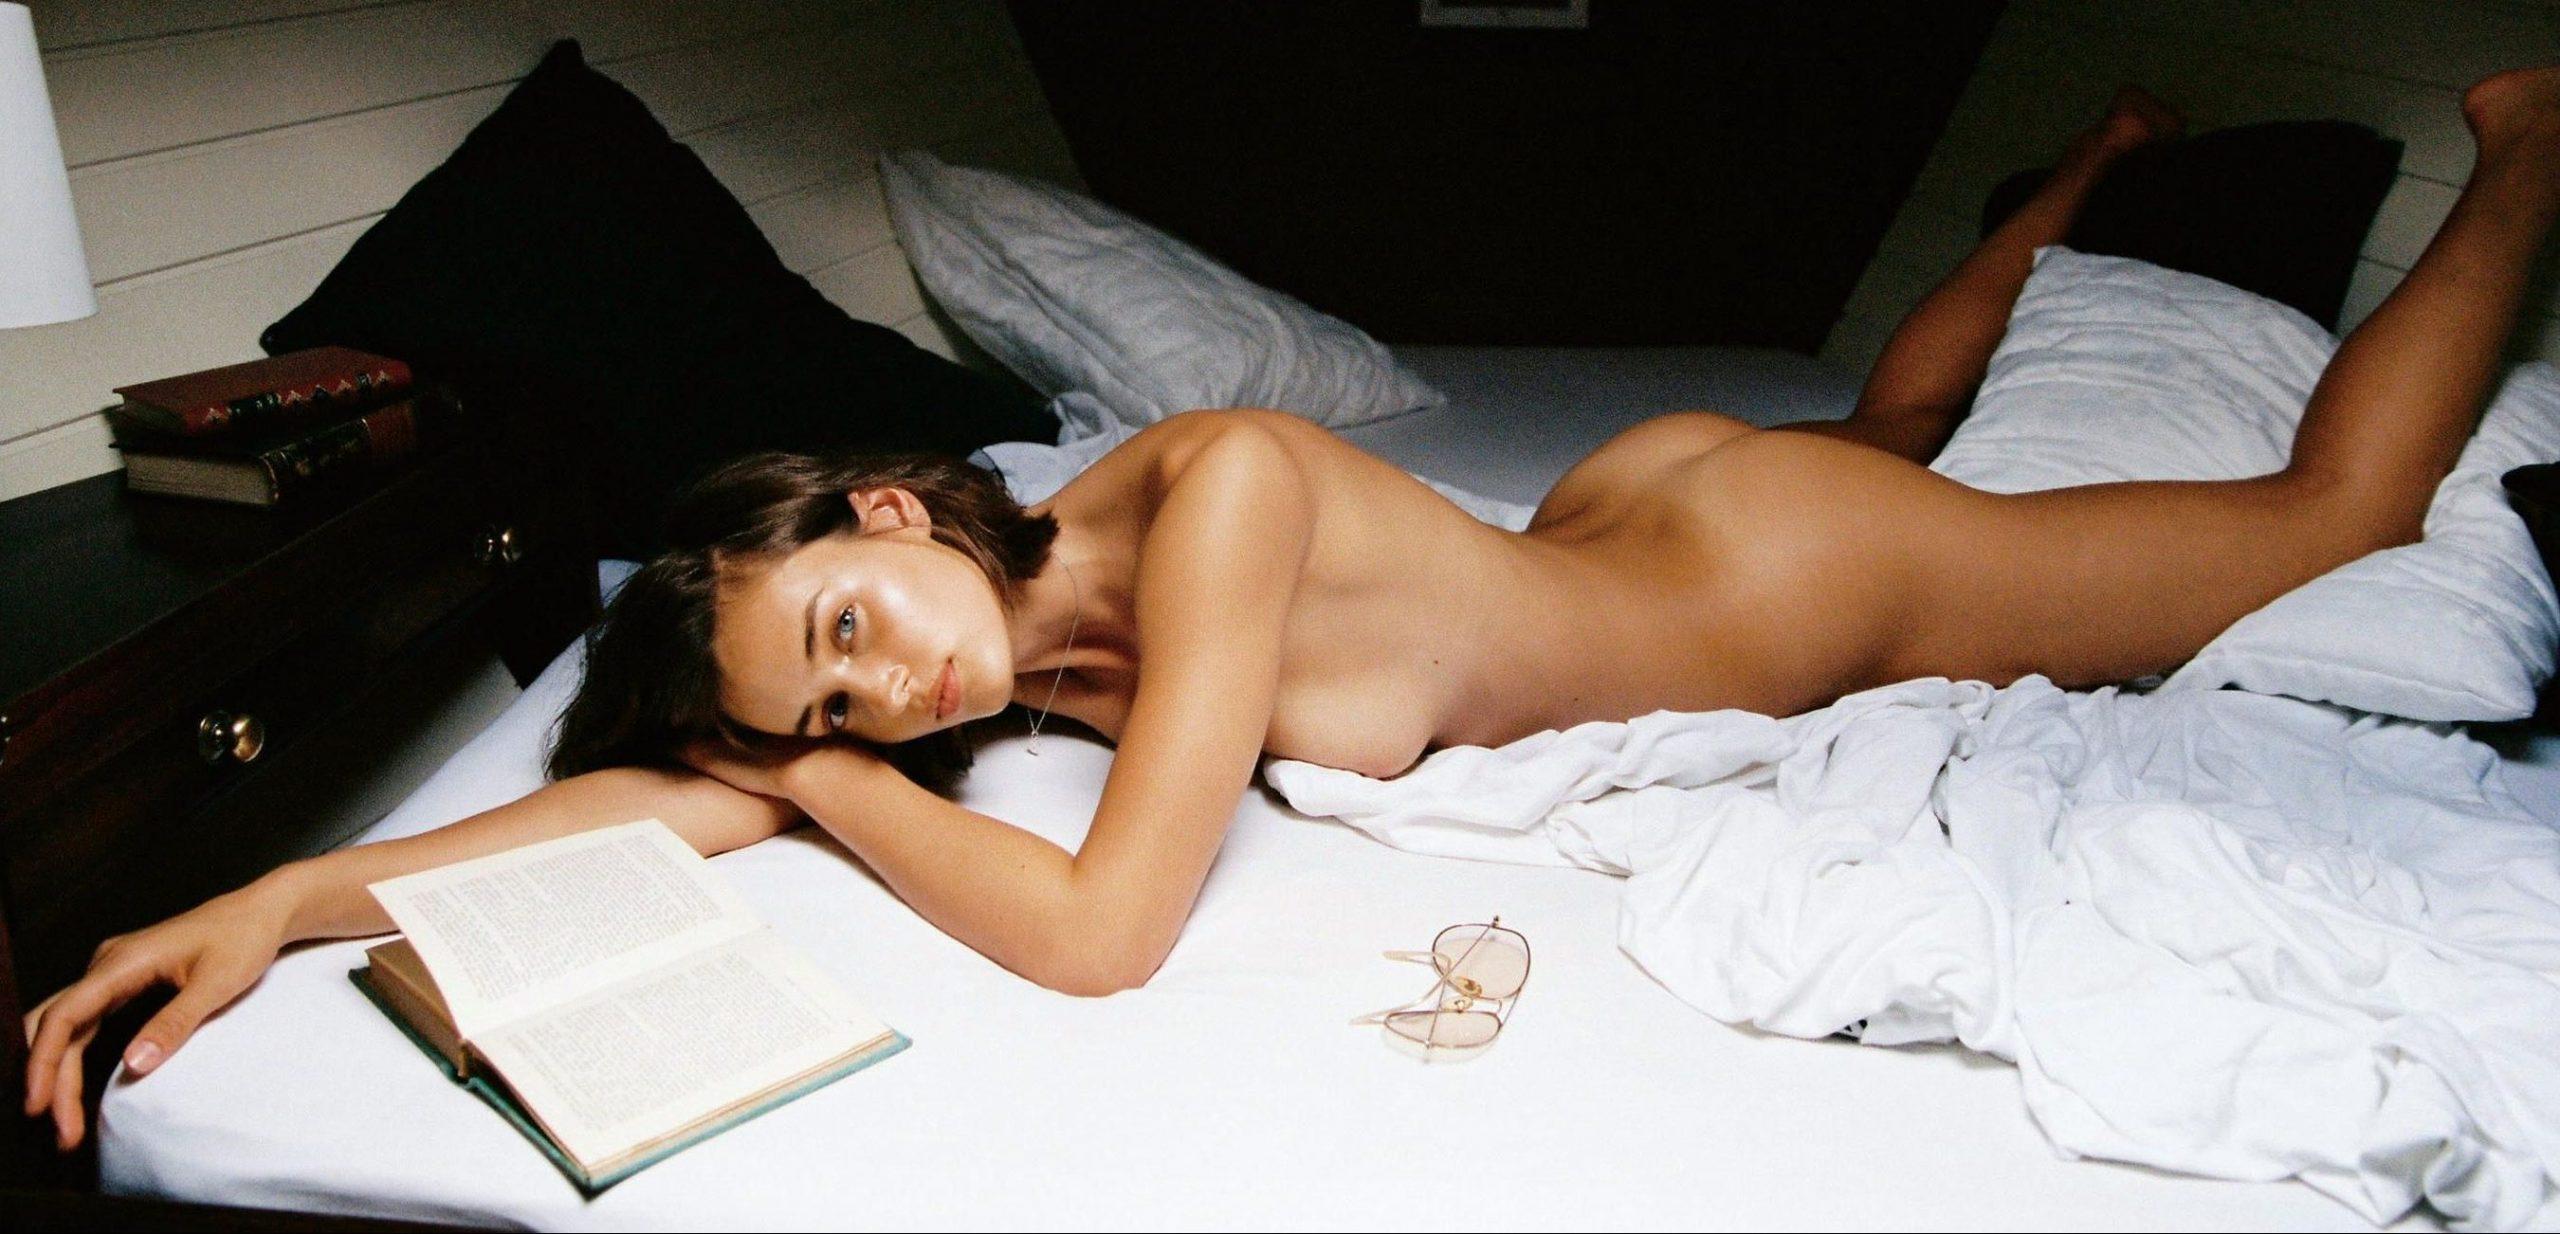 Johanne Landbo photographed by Cameron Hammond for Playboy, November & December 2017 1